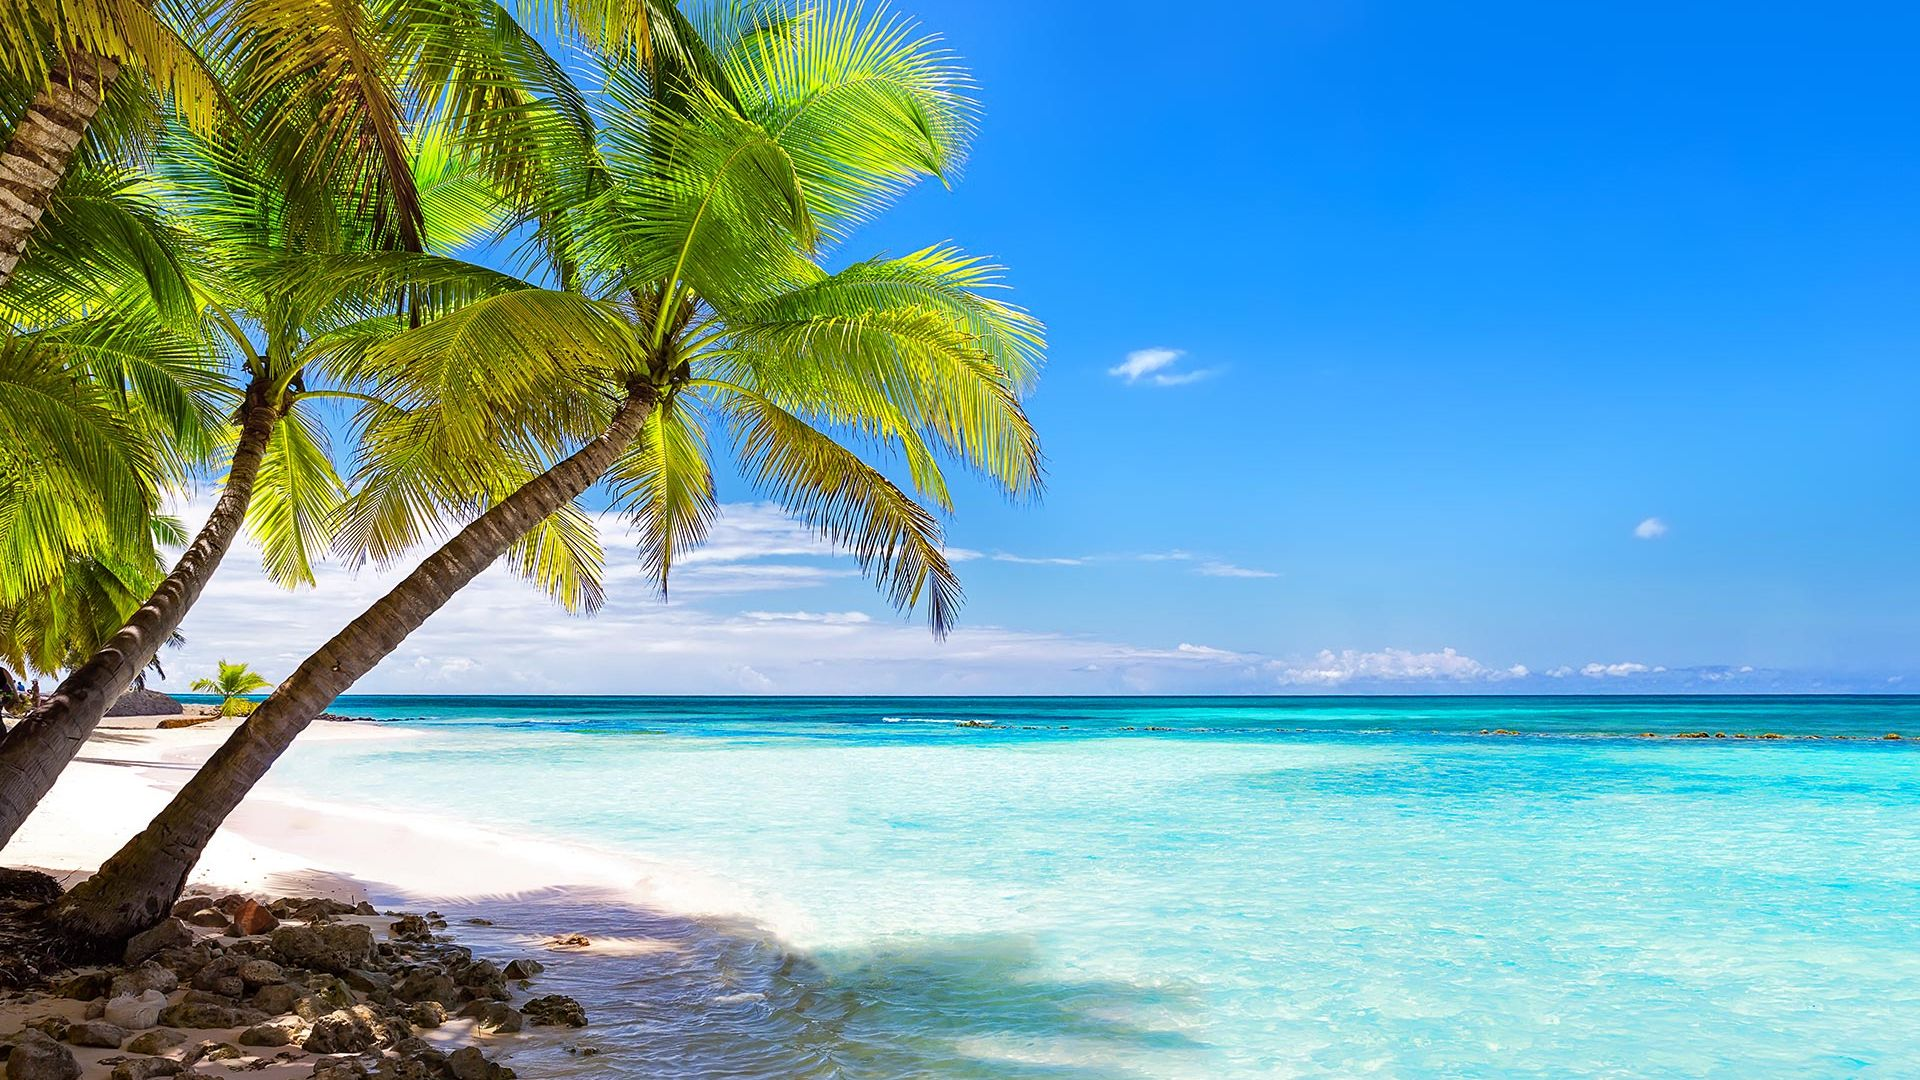 Sejur plaja Iberostar Hotels & Resort Punta Cana, 9 zile - 22 august 2021